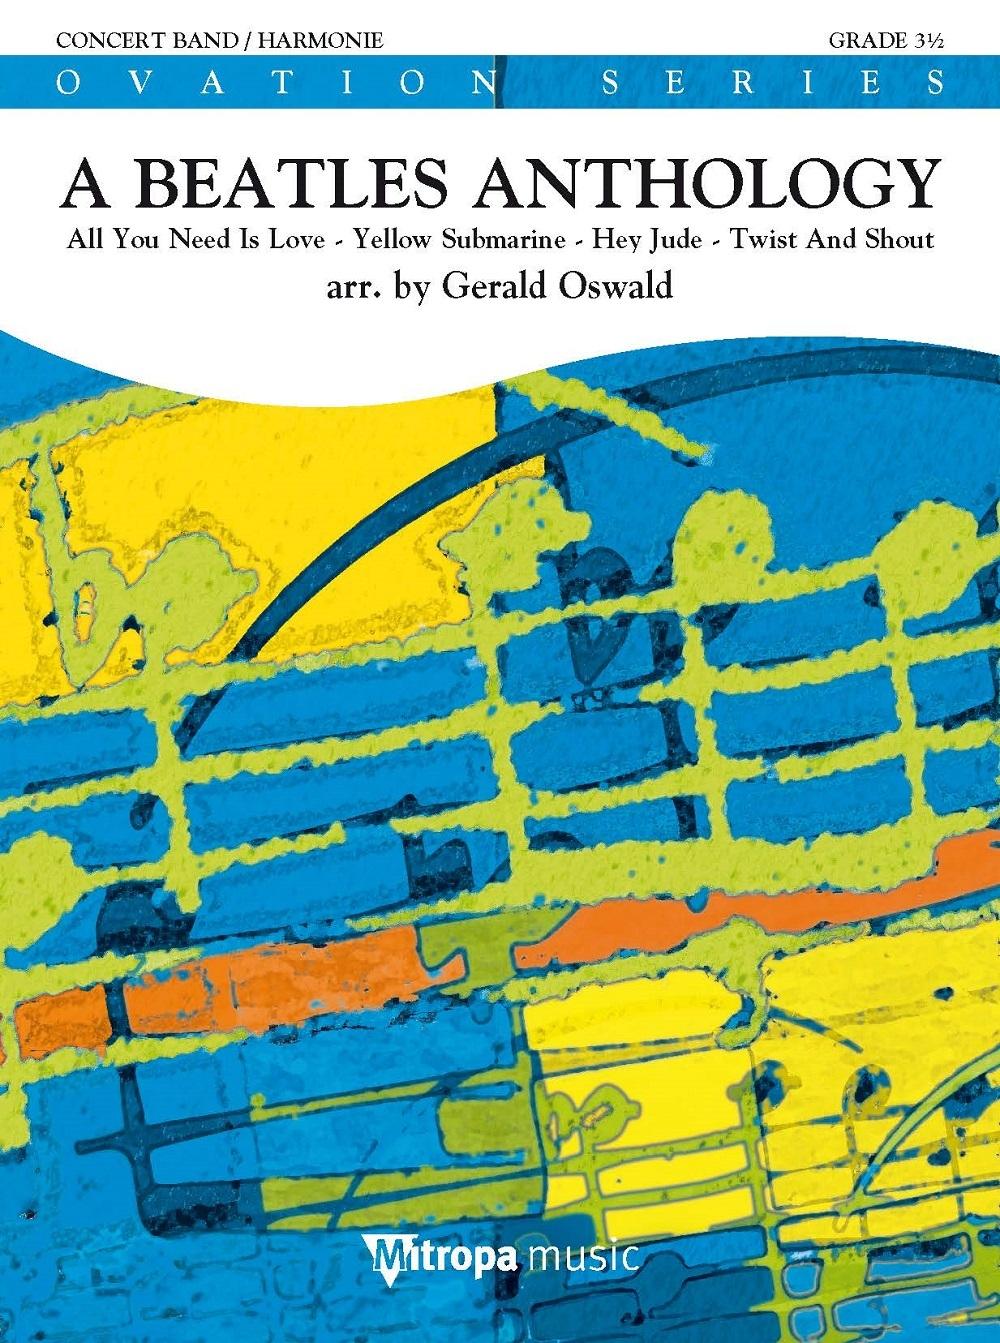 A Beatles Anthology: Concert Band: Score & Parts